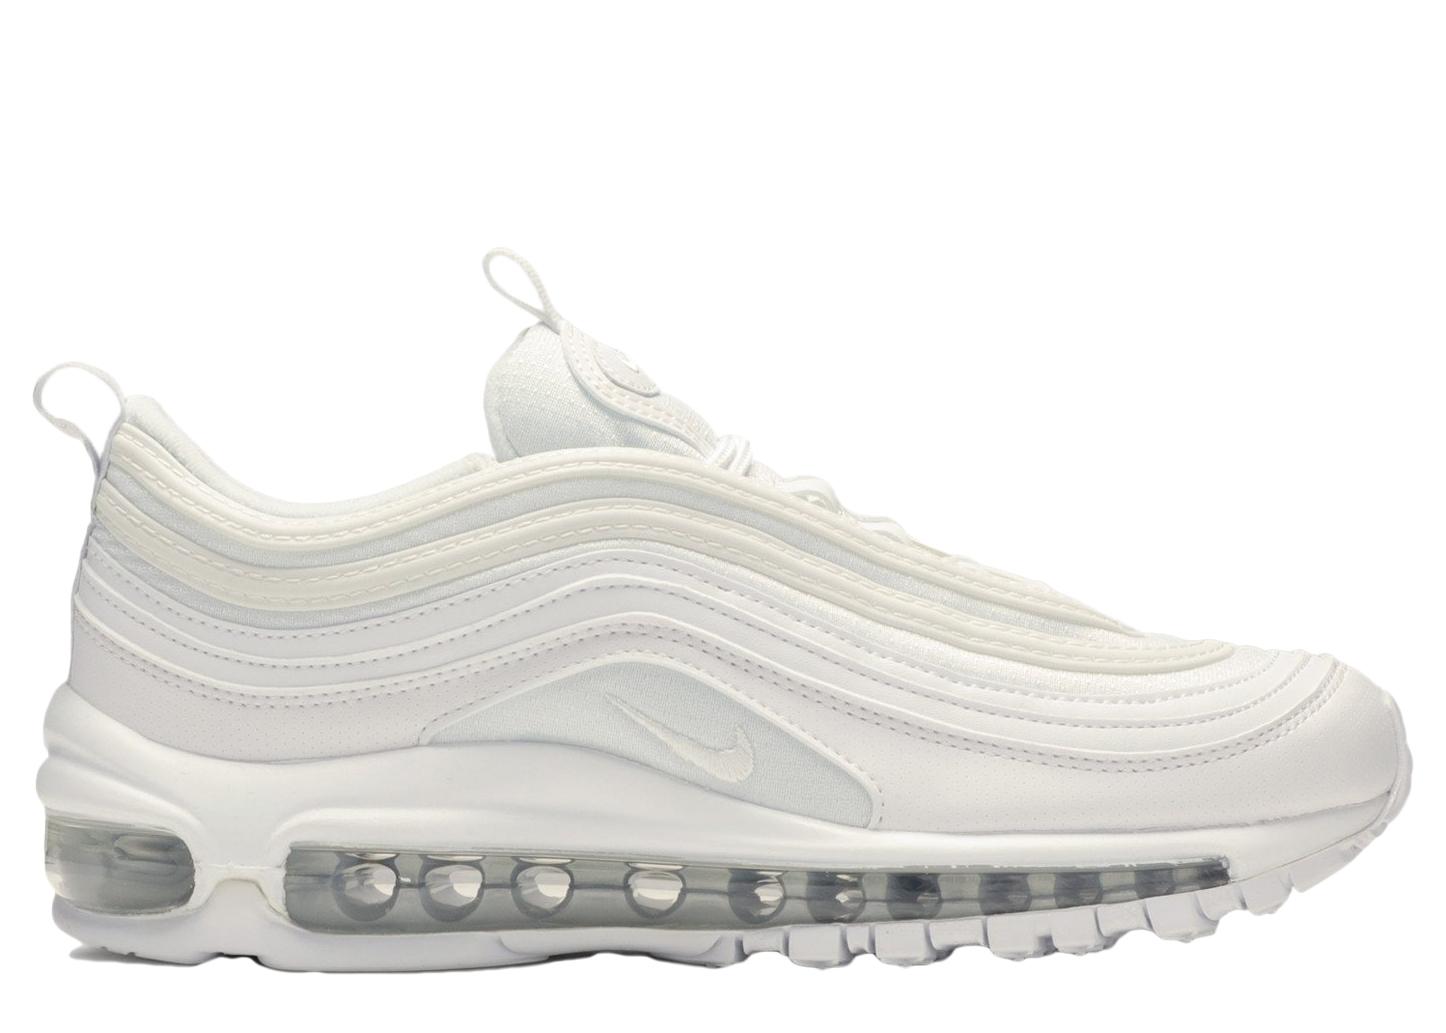 Nike Air Max 97 White Metallic Silver